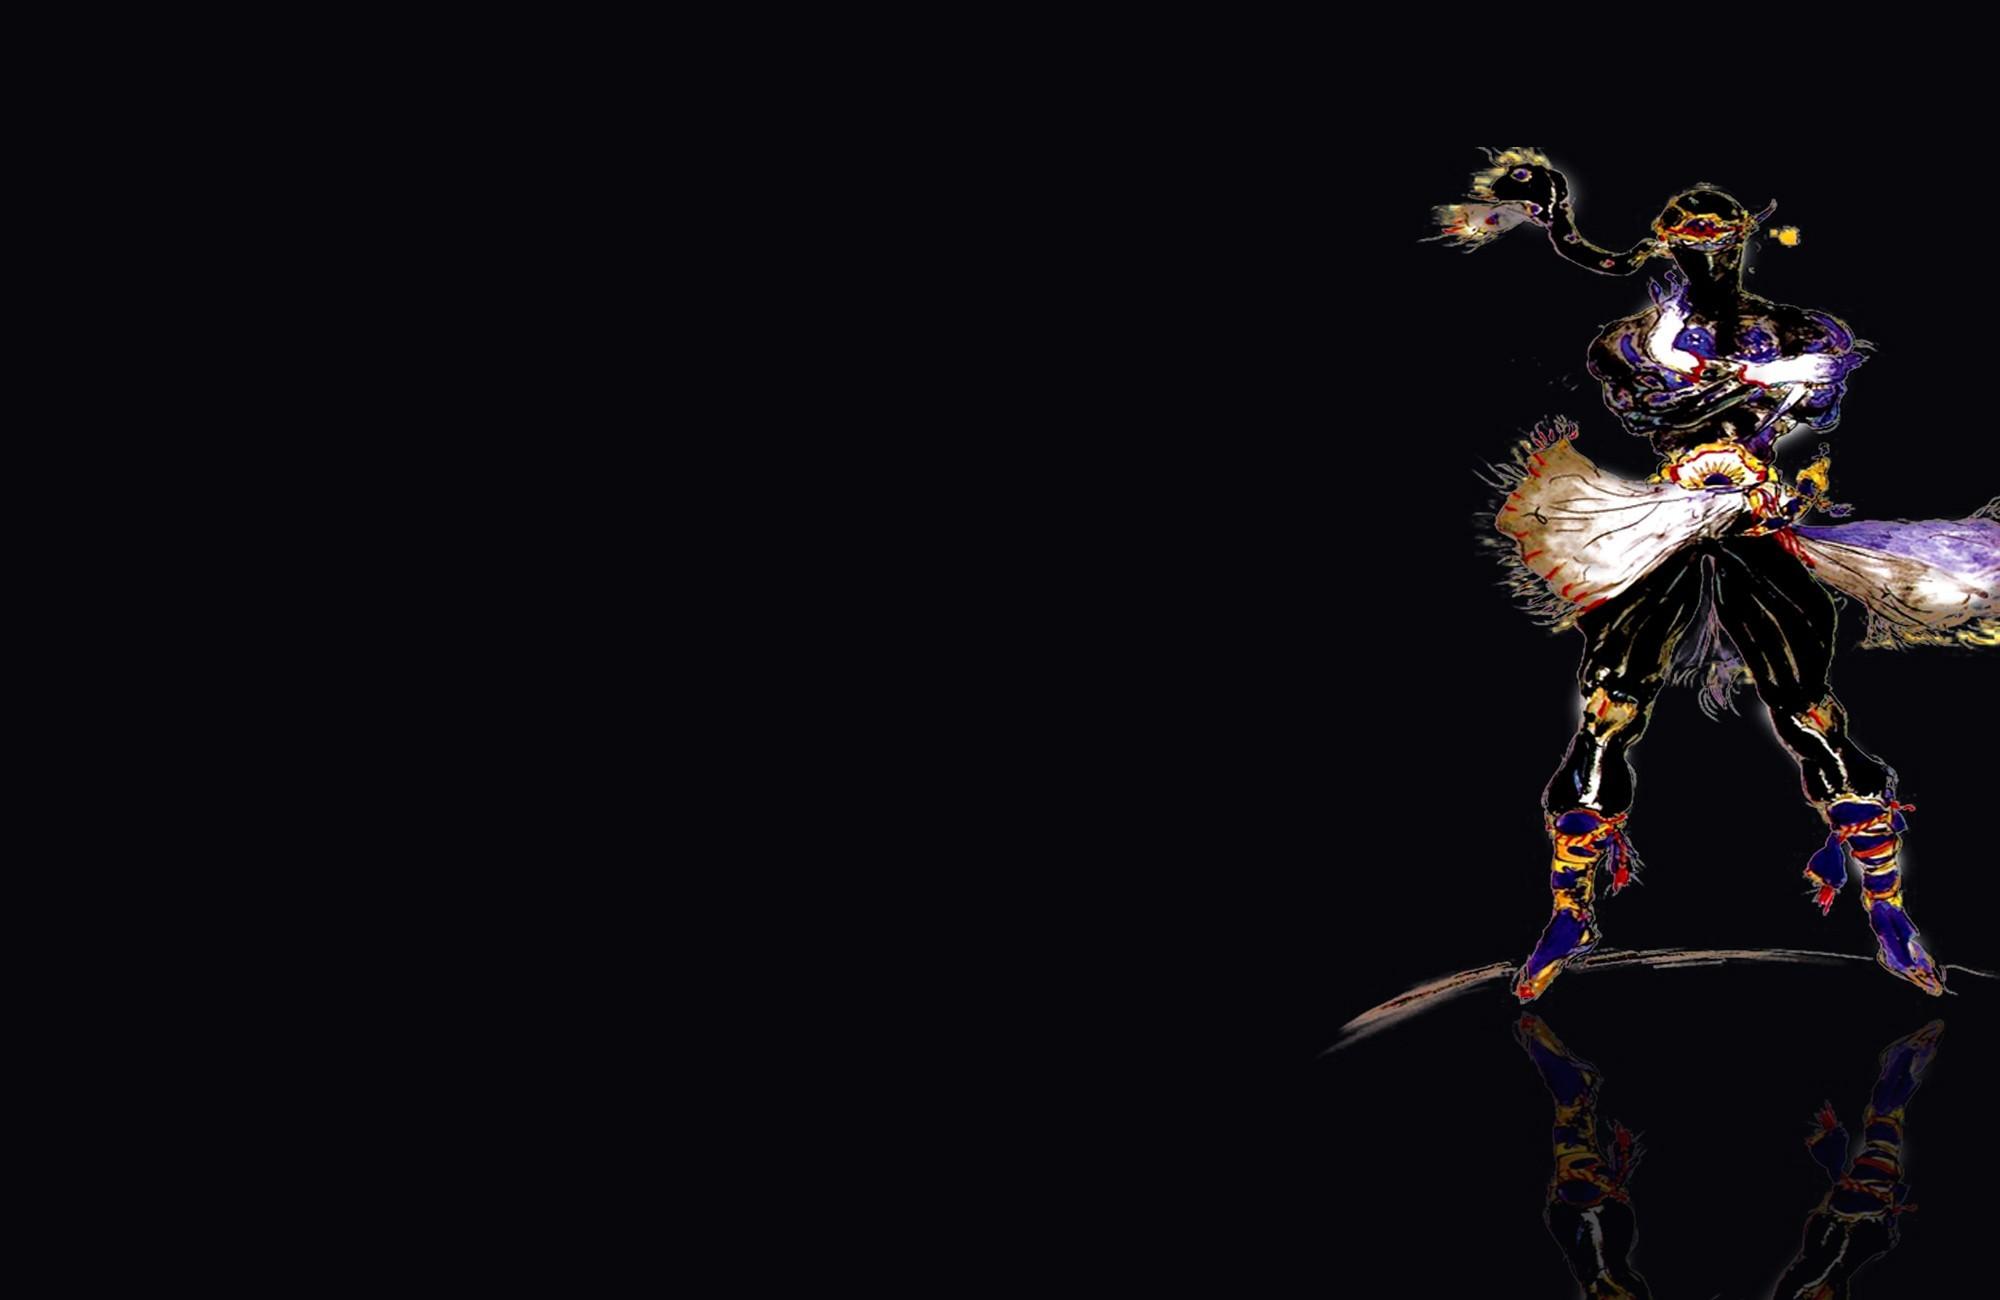 Final Fantasy Vi Wallpaper 80 Images